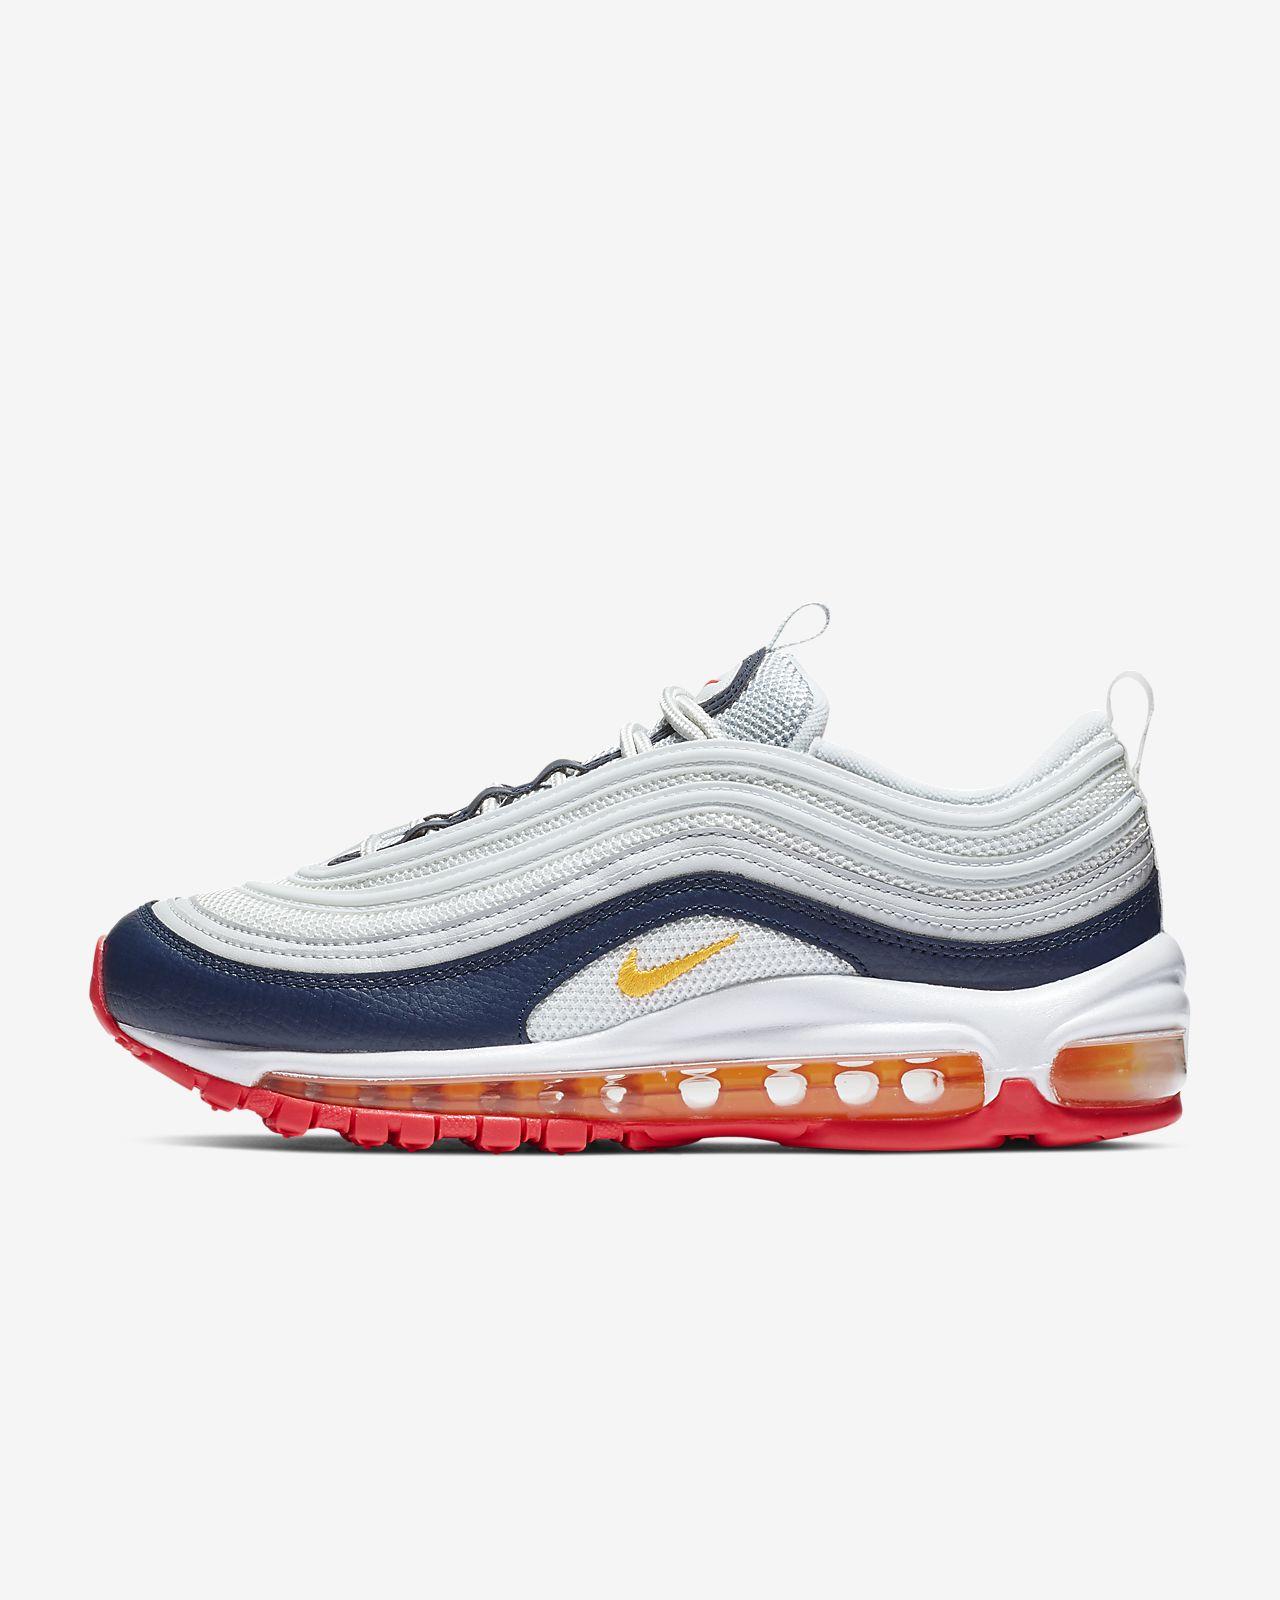 648f4f640b203 Nike Air Max 97 Premium Women's Shoe. Nike.com HU